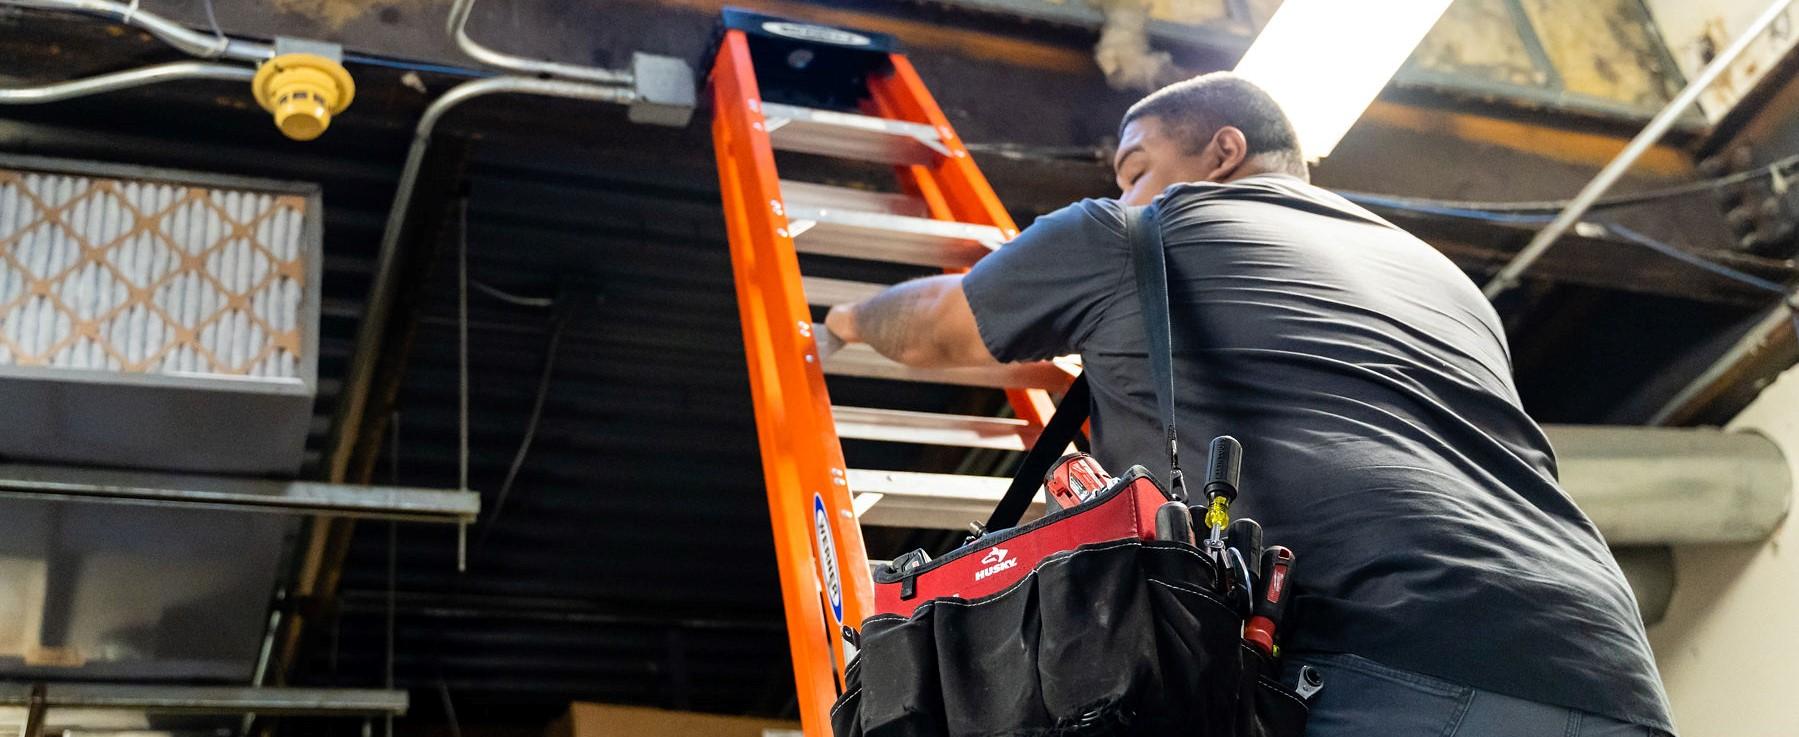 Preventative Maintenance Helps Prevent Equipment Failure